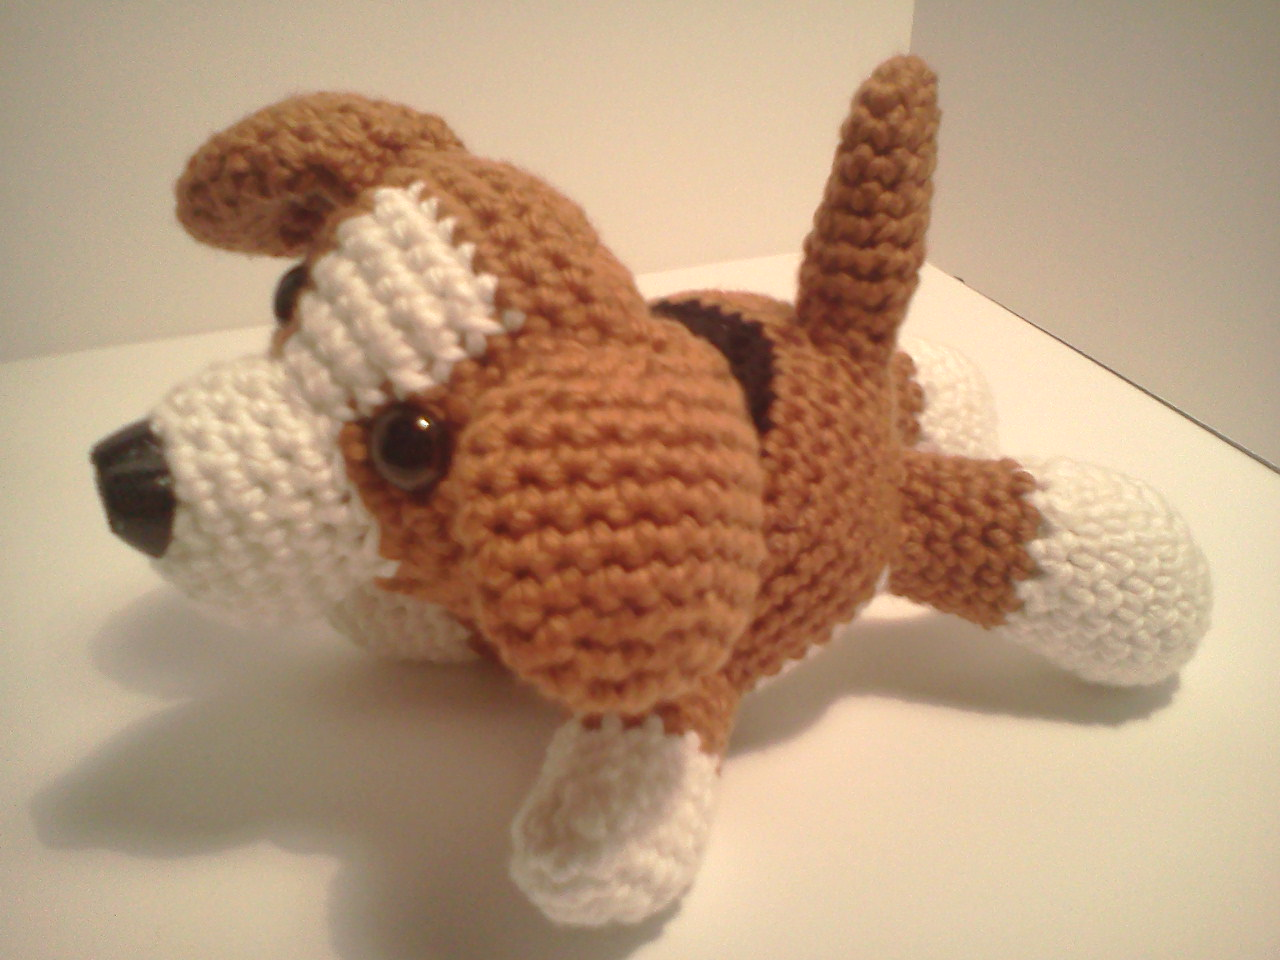 Amigurumi Puppy Crochet Pattern : Serendipity Creative: Lily Baby Beagle AmiPal Amigurumi ...